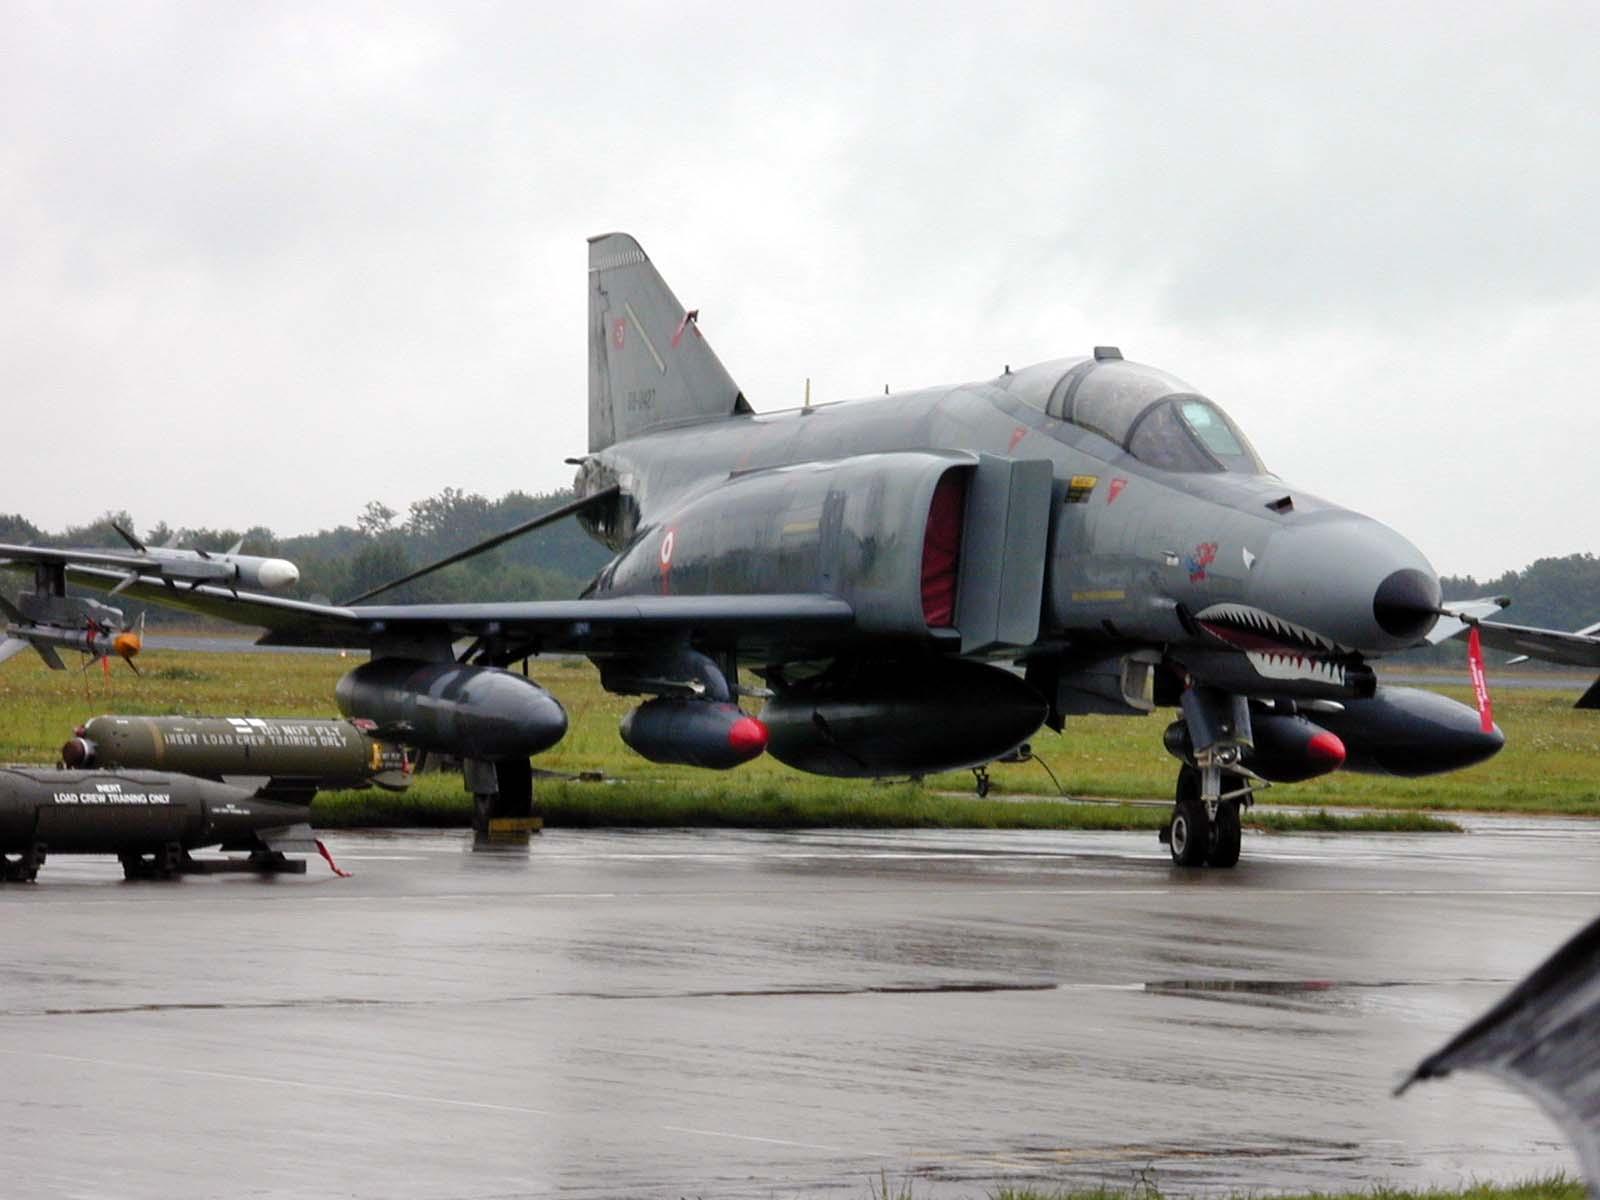 jet fighter jetfighter plane airplane miitary combat war bomb bombs missile missles rocket rockets